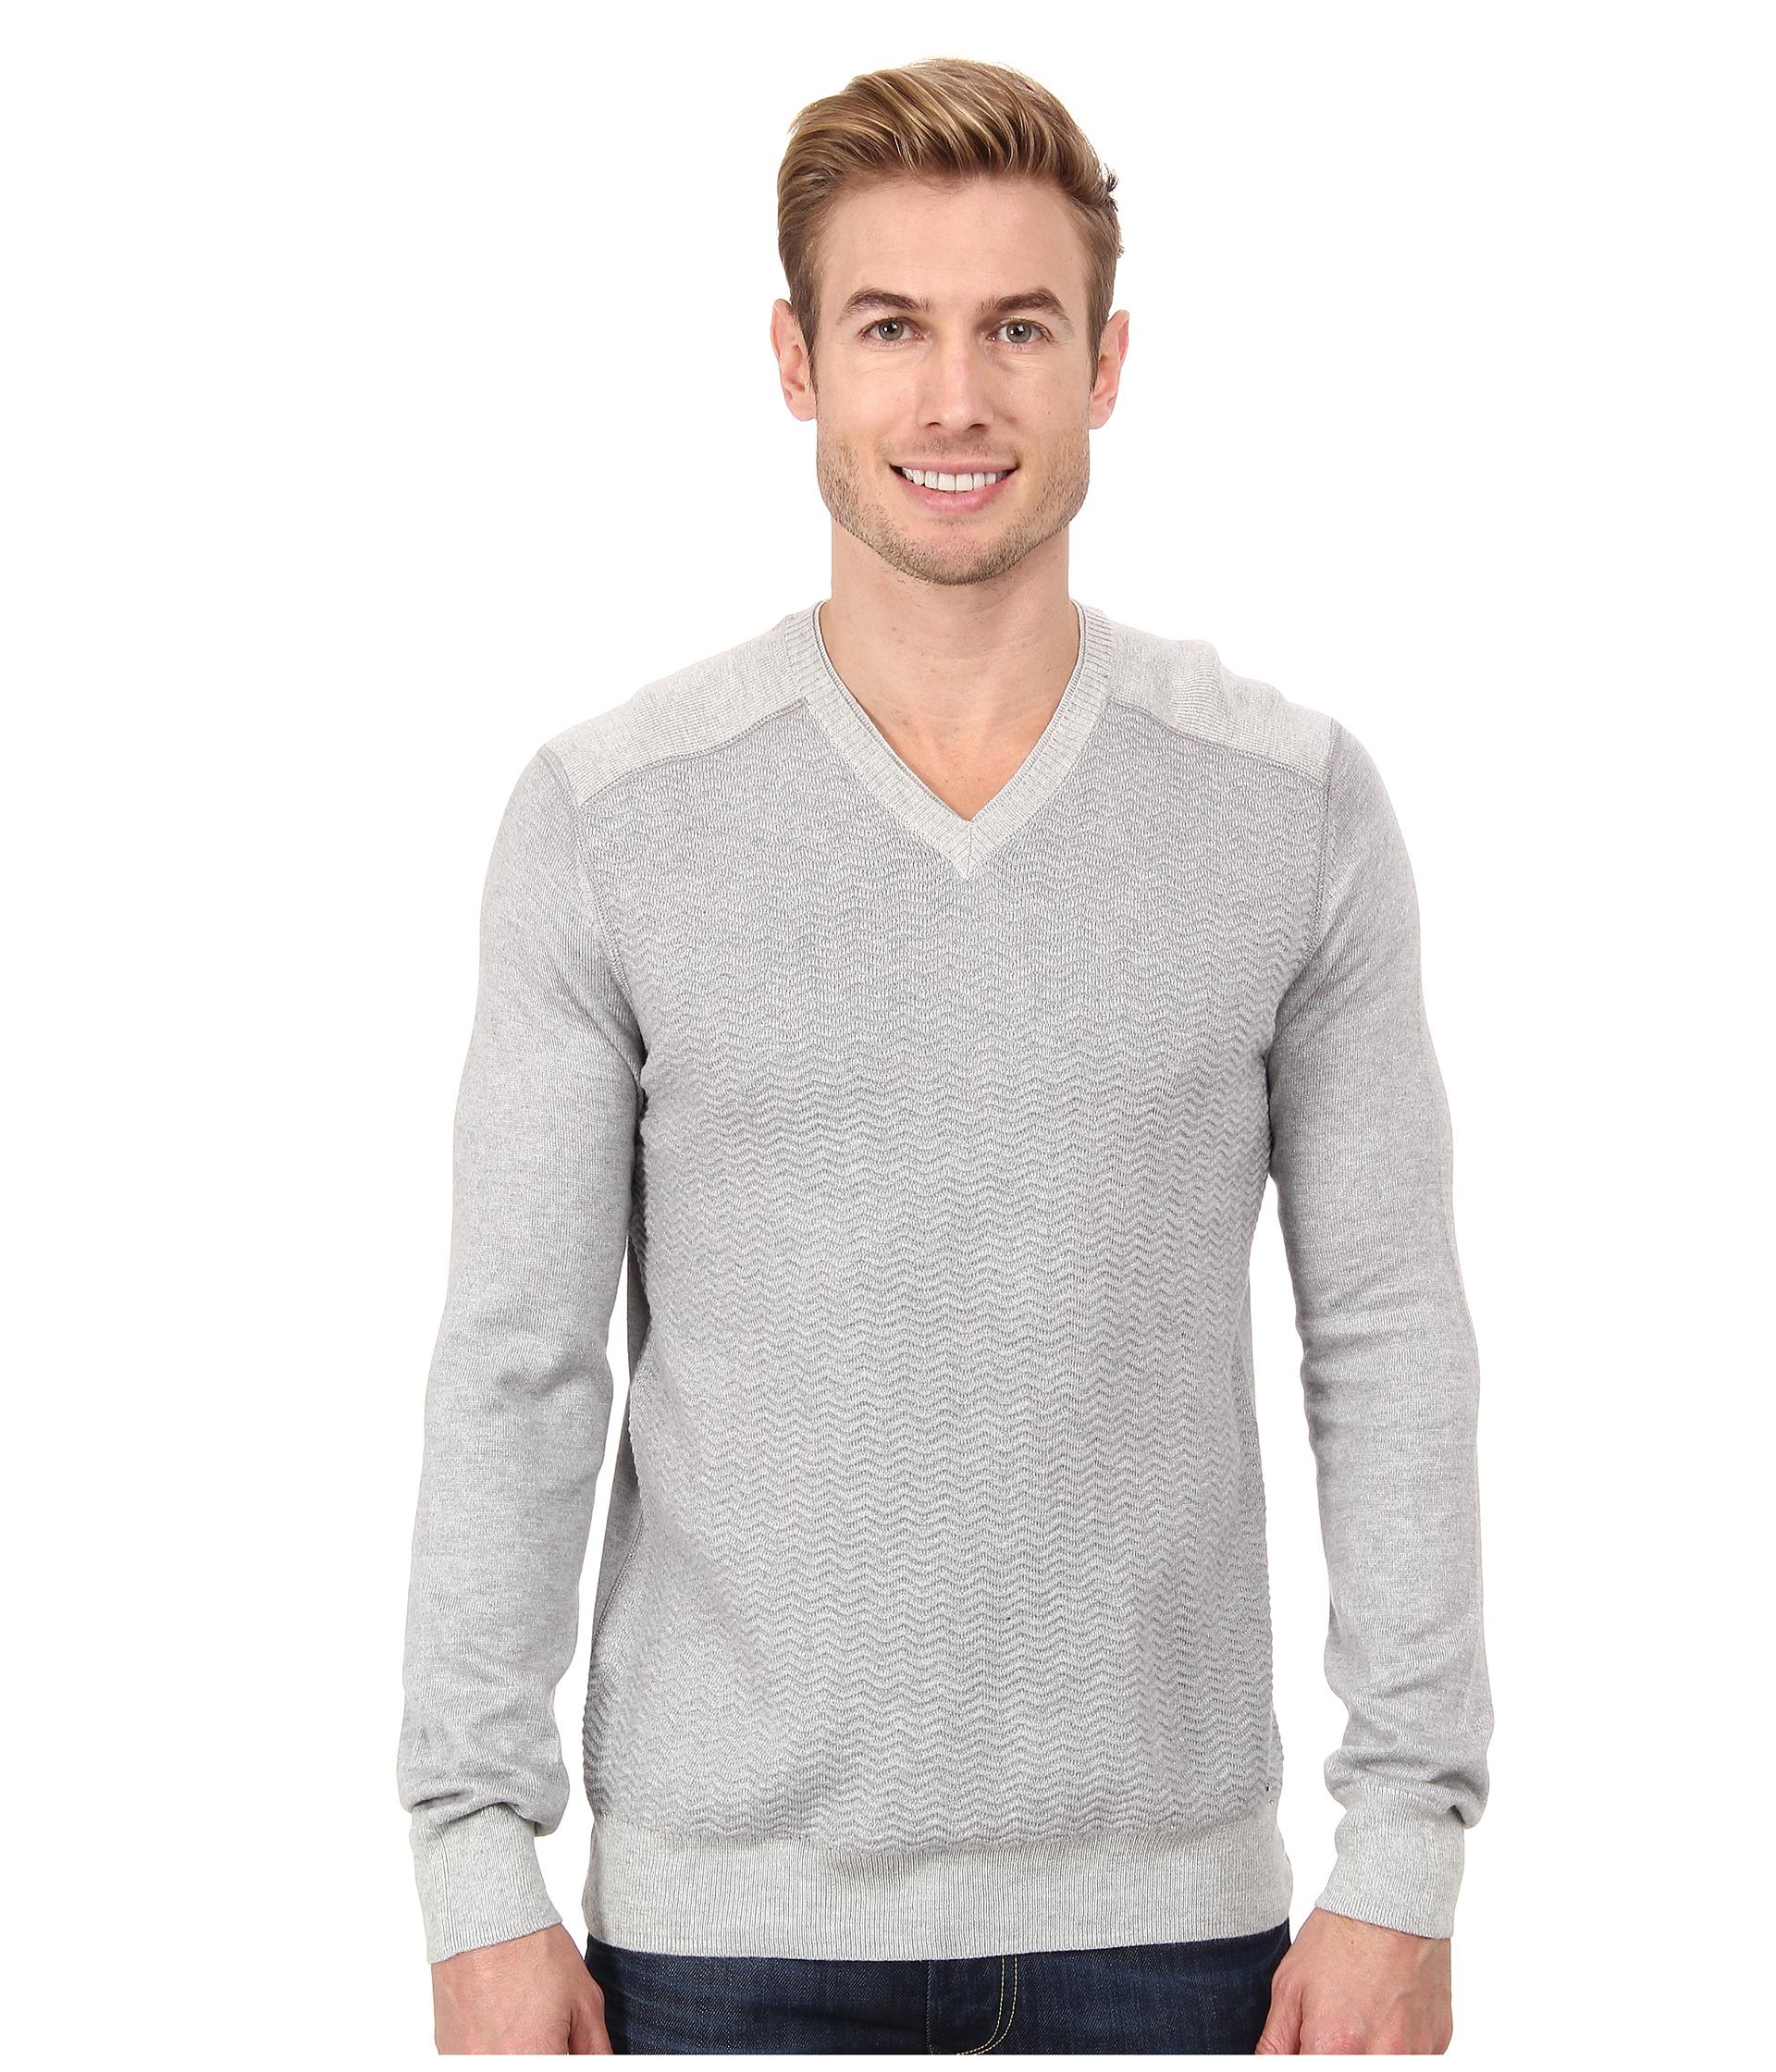 calvin klein jeans texture stitch v neck sweater soft grey. Black Bedroom Furniture Sets. Home Design Ideas